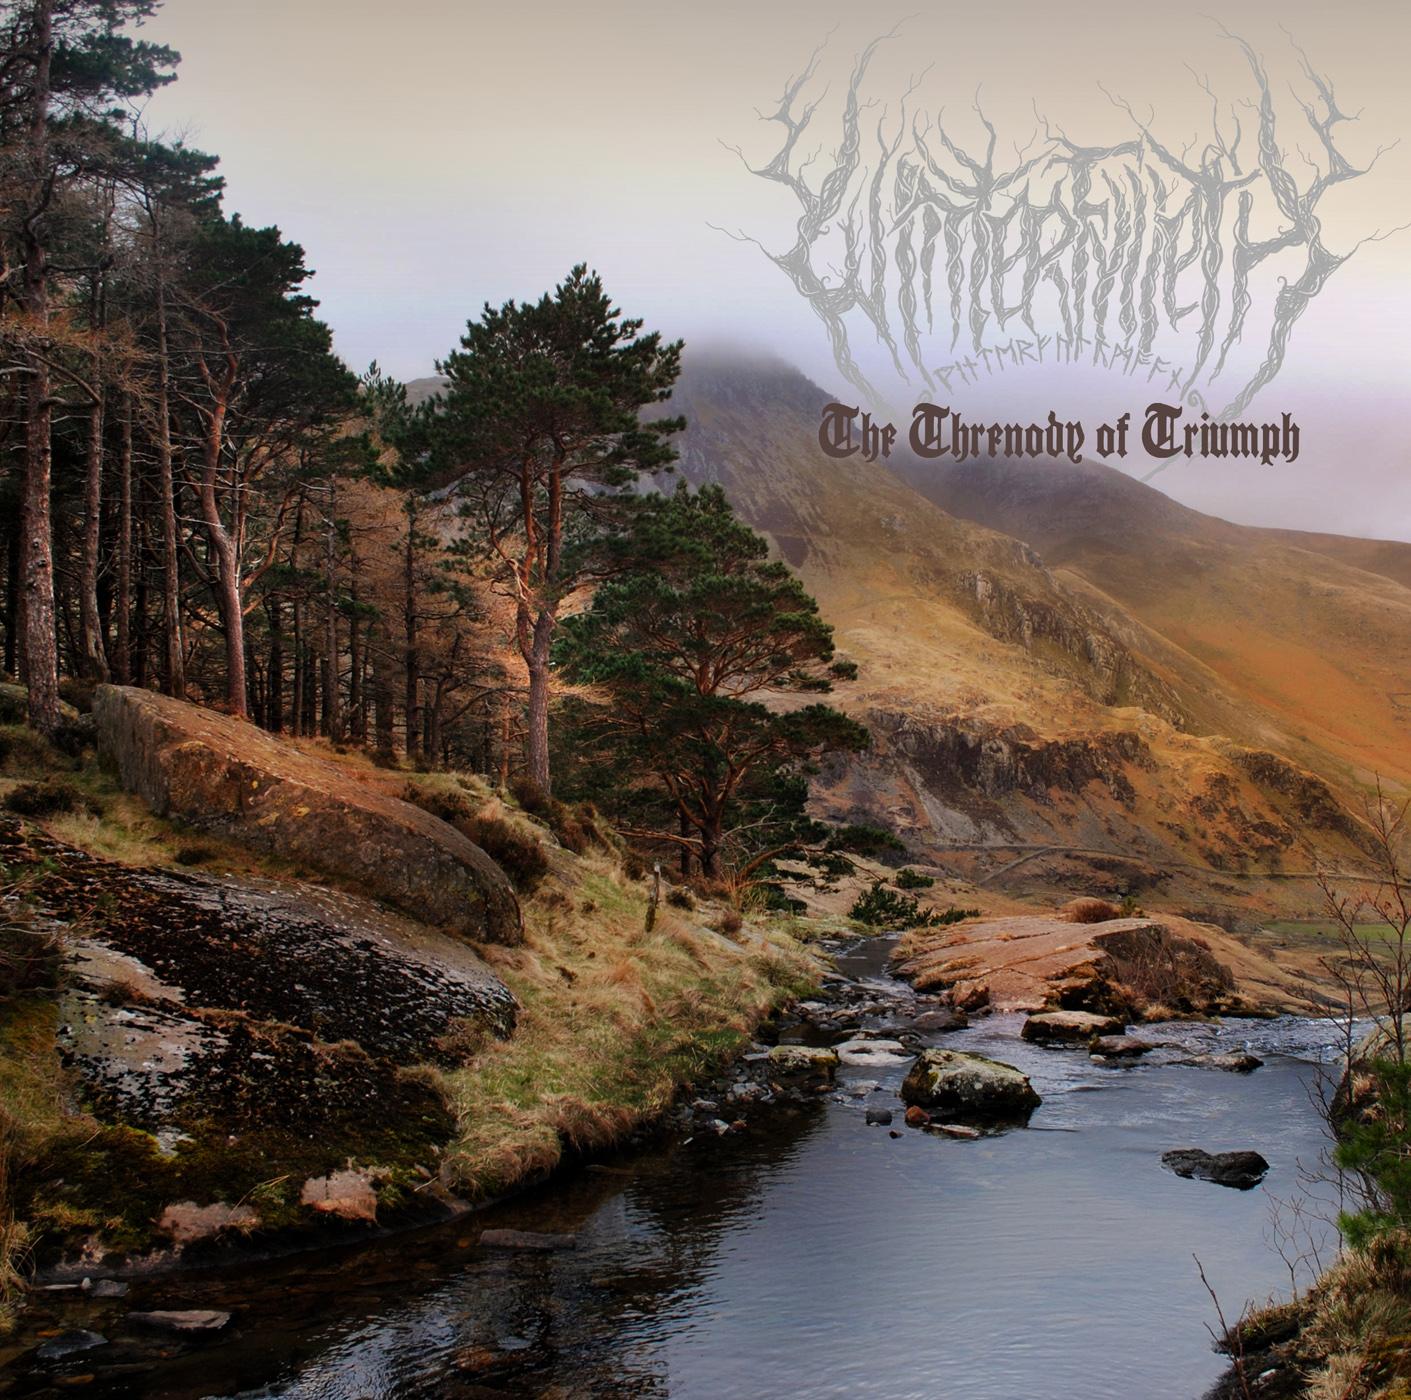 Metal Bandcamp: Winterfylleth - The Threnody of Triumph